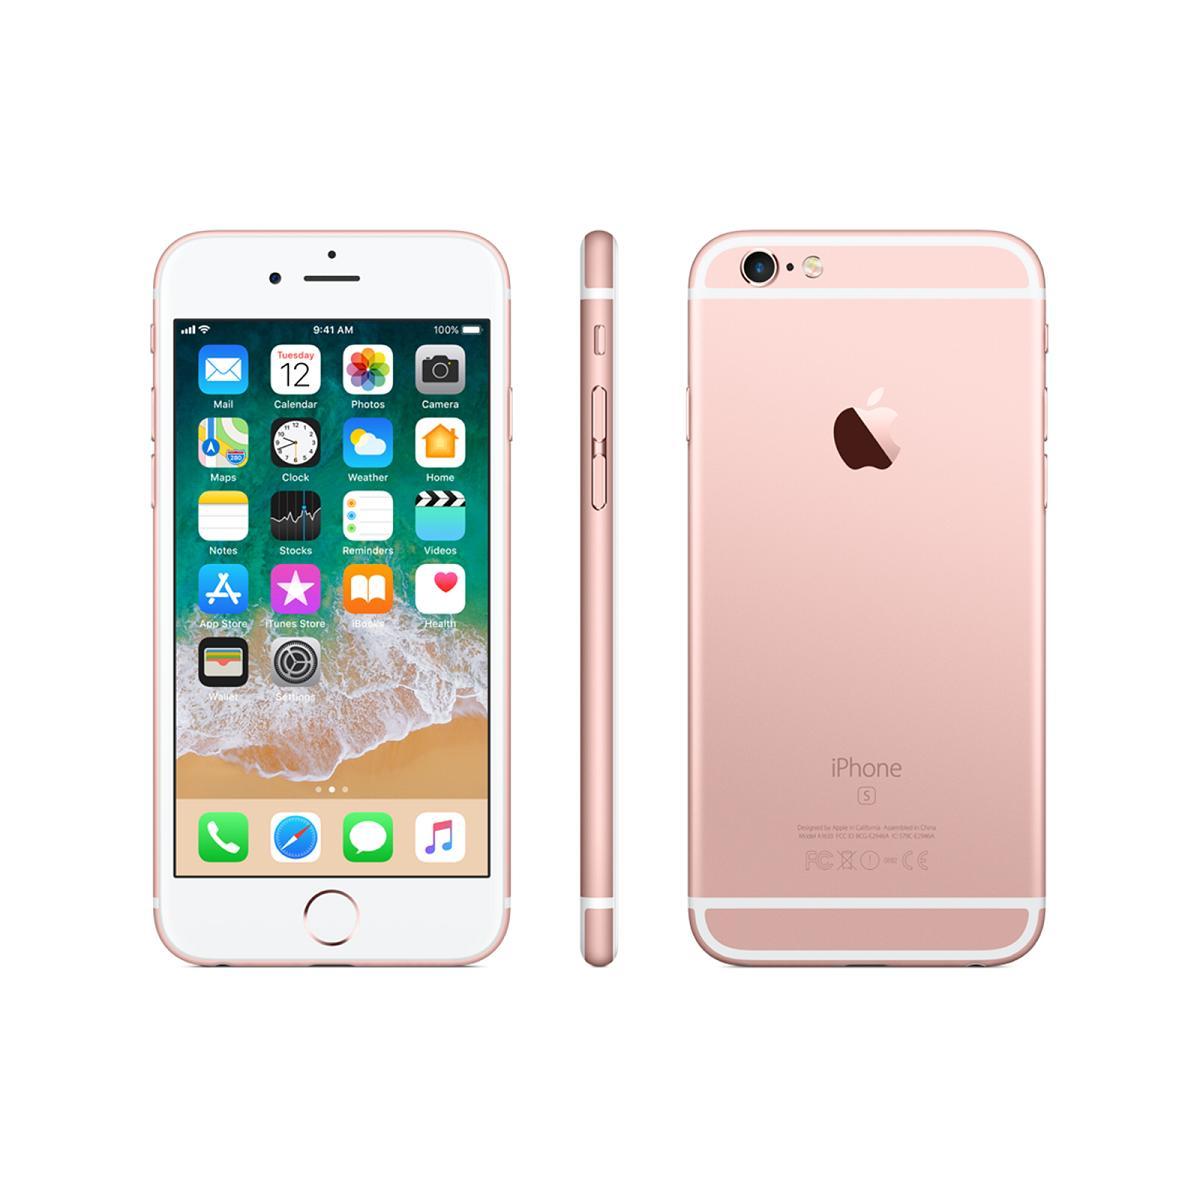 iPhone 6s 32GB 本体 SIMフリー ローズゴールド 新品未開封 Apple 1年保証 アップル iPhone6s docomo版 正規SIMロック解除済み RoseGold MN122J/A A1688 一括購入品 ネットーワーク利用制限〇 白ロム